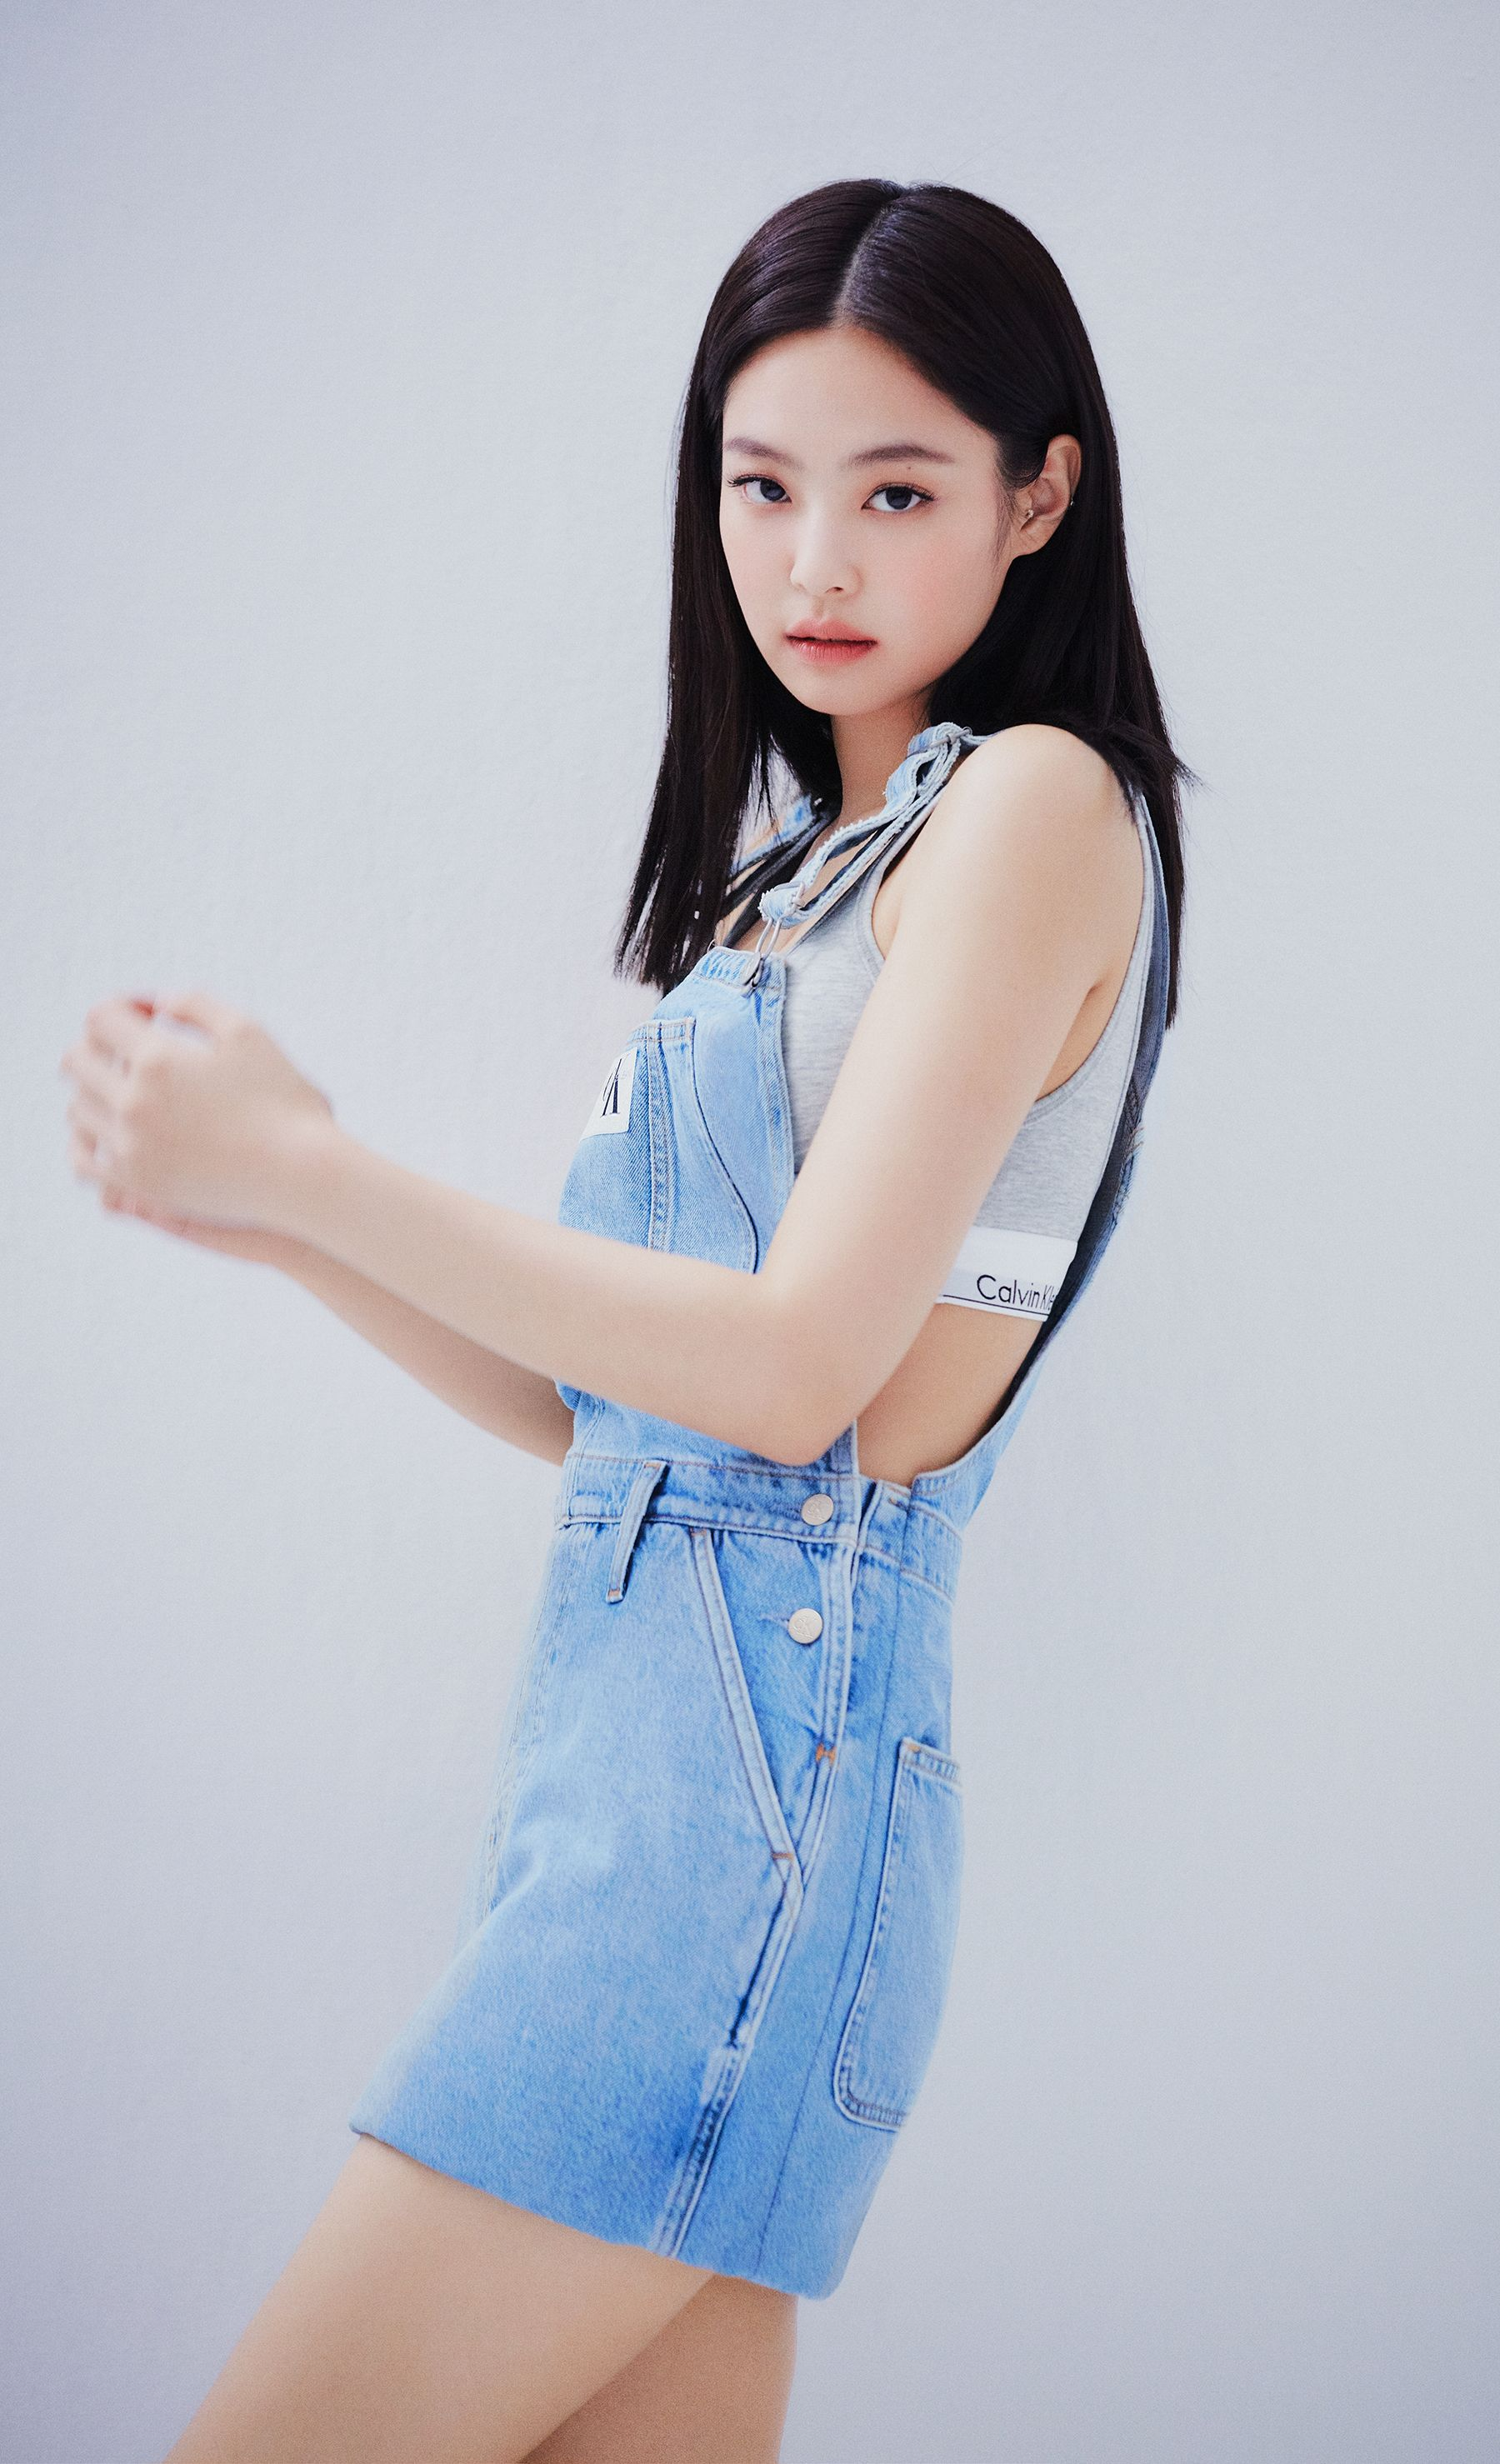 Blackpink Jennie for Calvin Klein Jeans Pictorial (March 2020) (HD/HR) - K-Pop Database / dbkpop.com